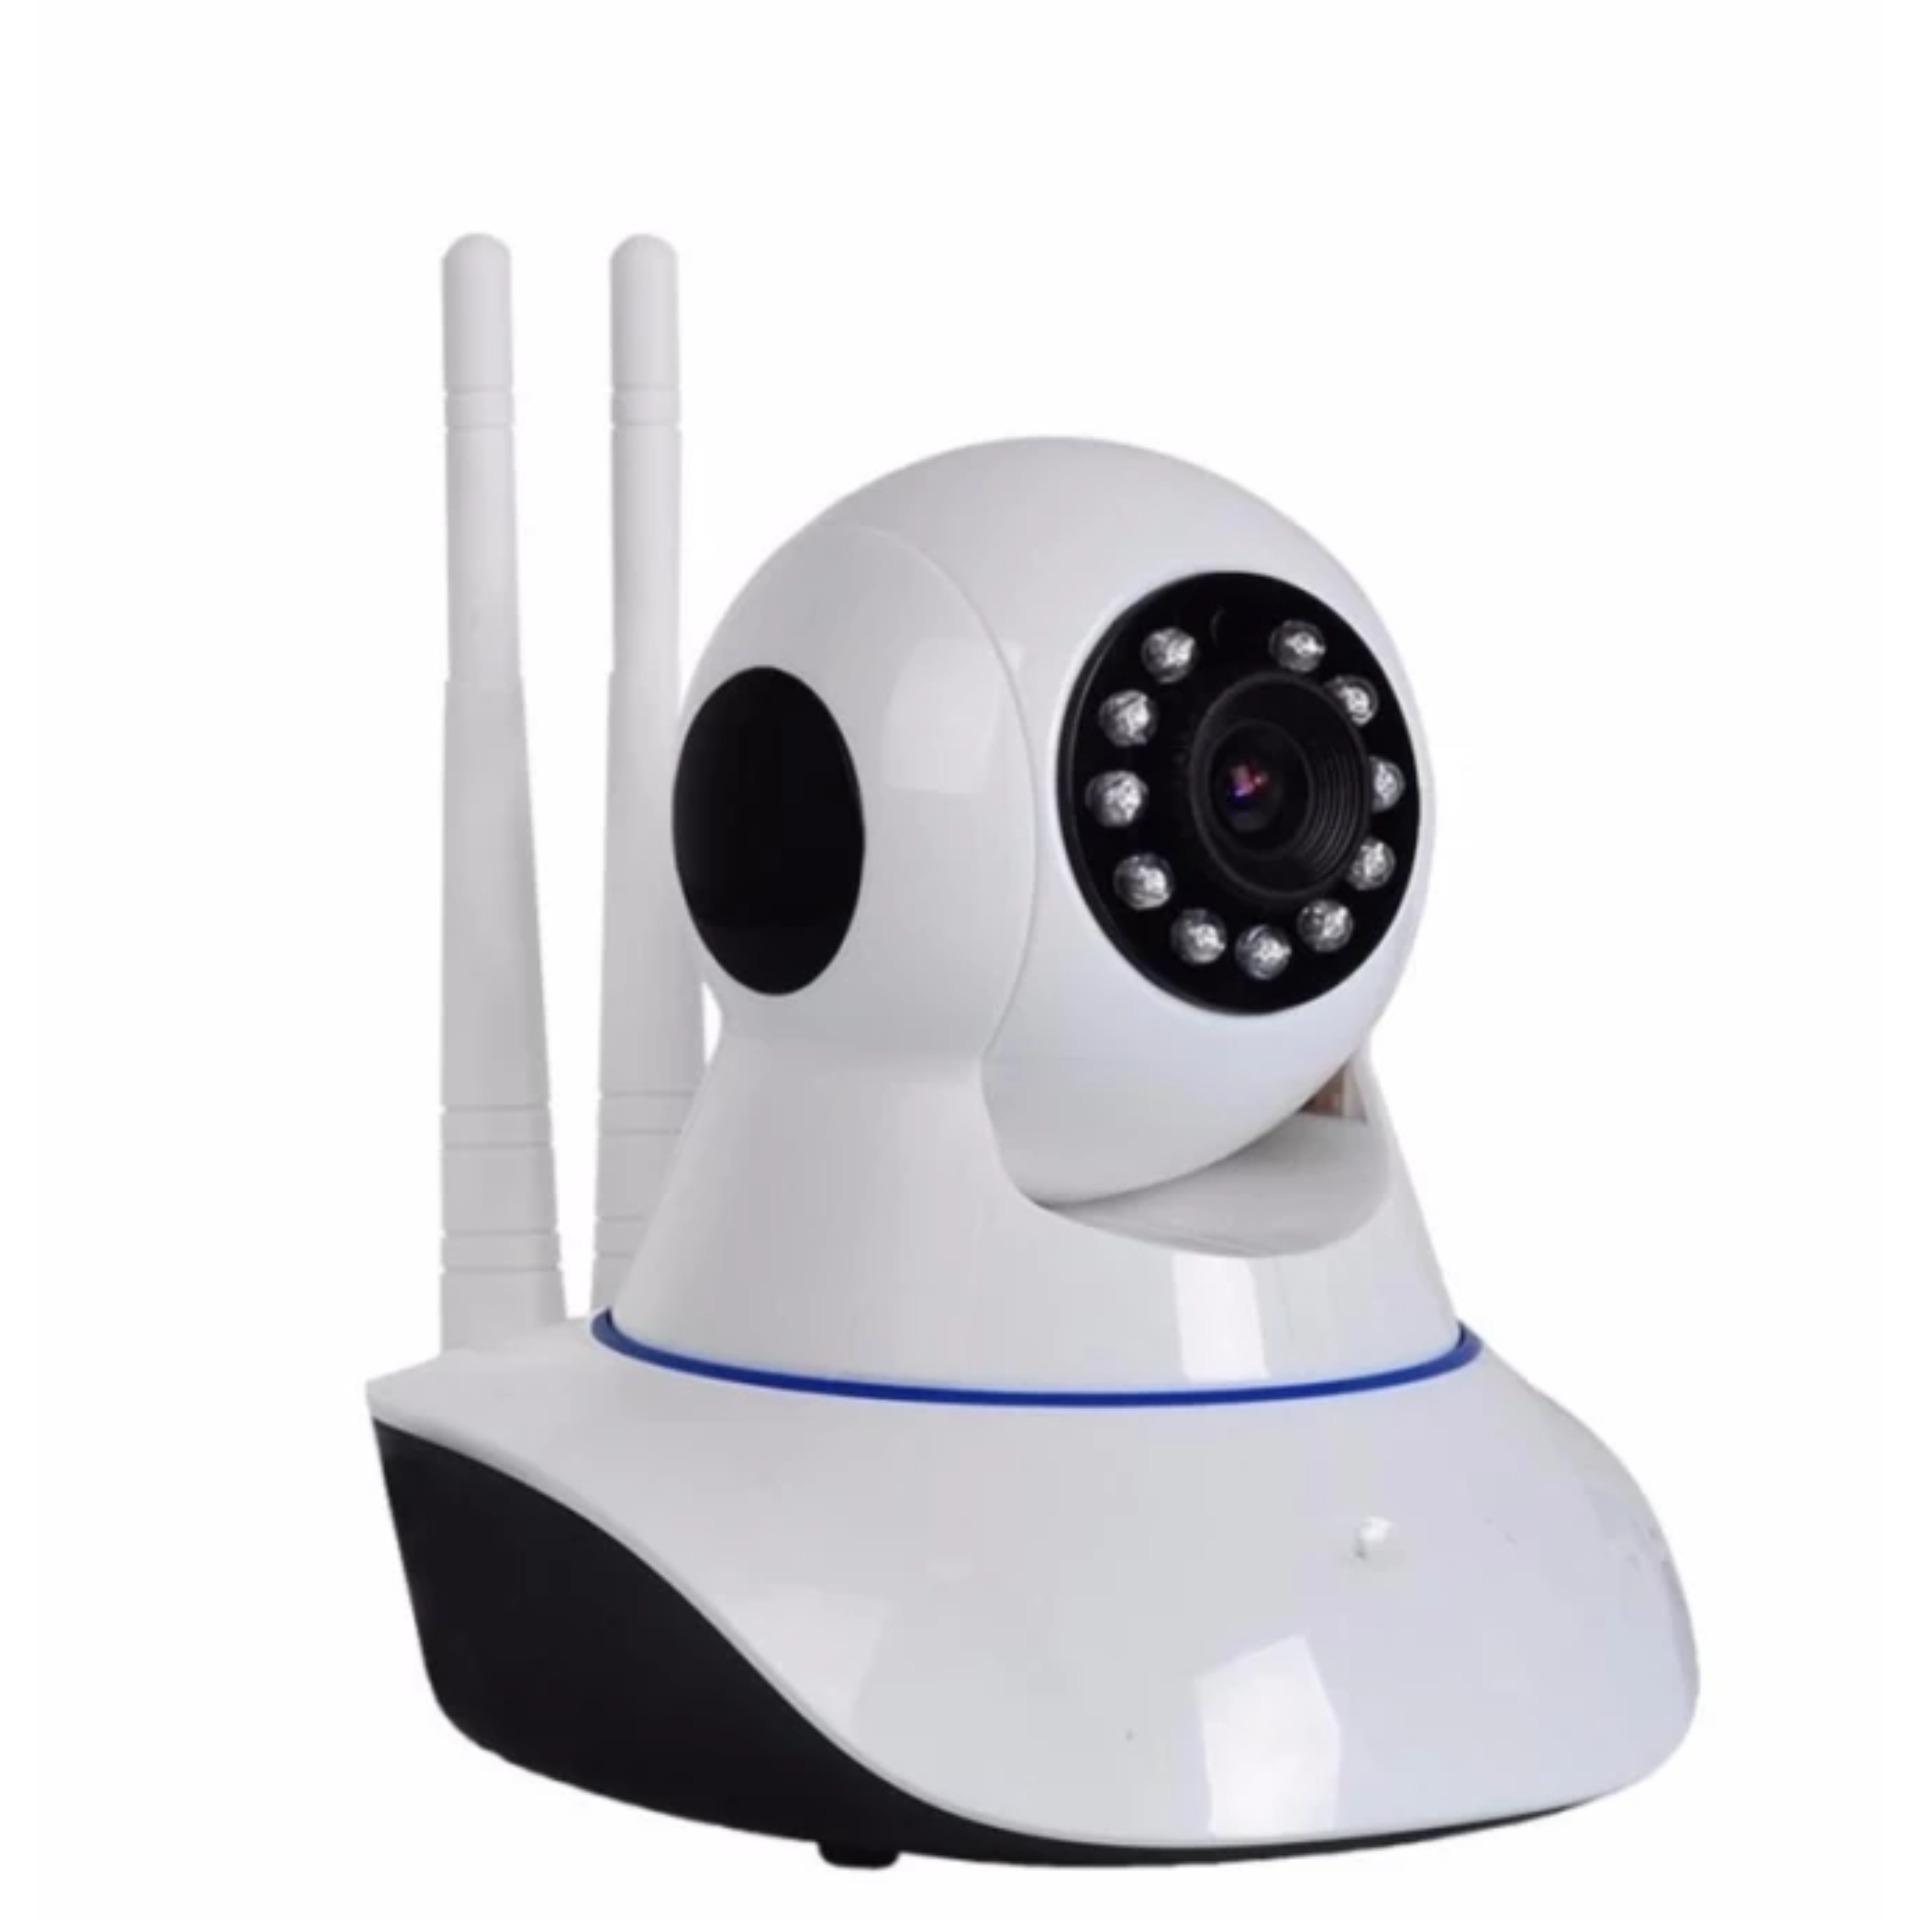 Camera HD Wireless IP Yoosee X8100 xoay 360 độ (Trắng)